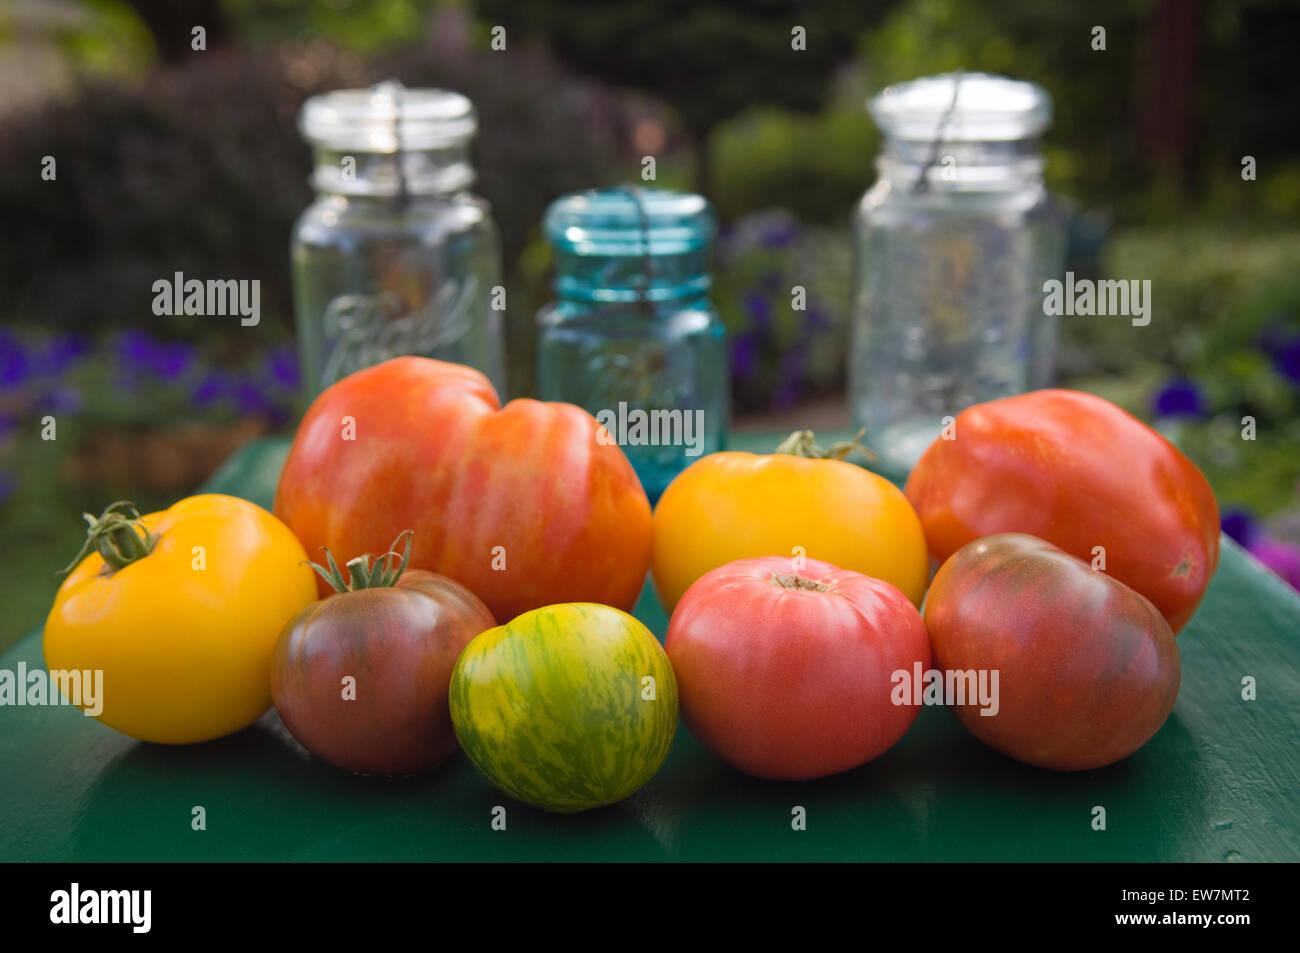 Heirloom Tomatos and Vintage Canning Jars - Stock Image